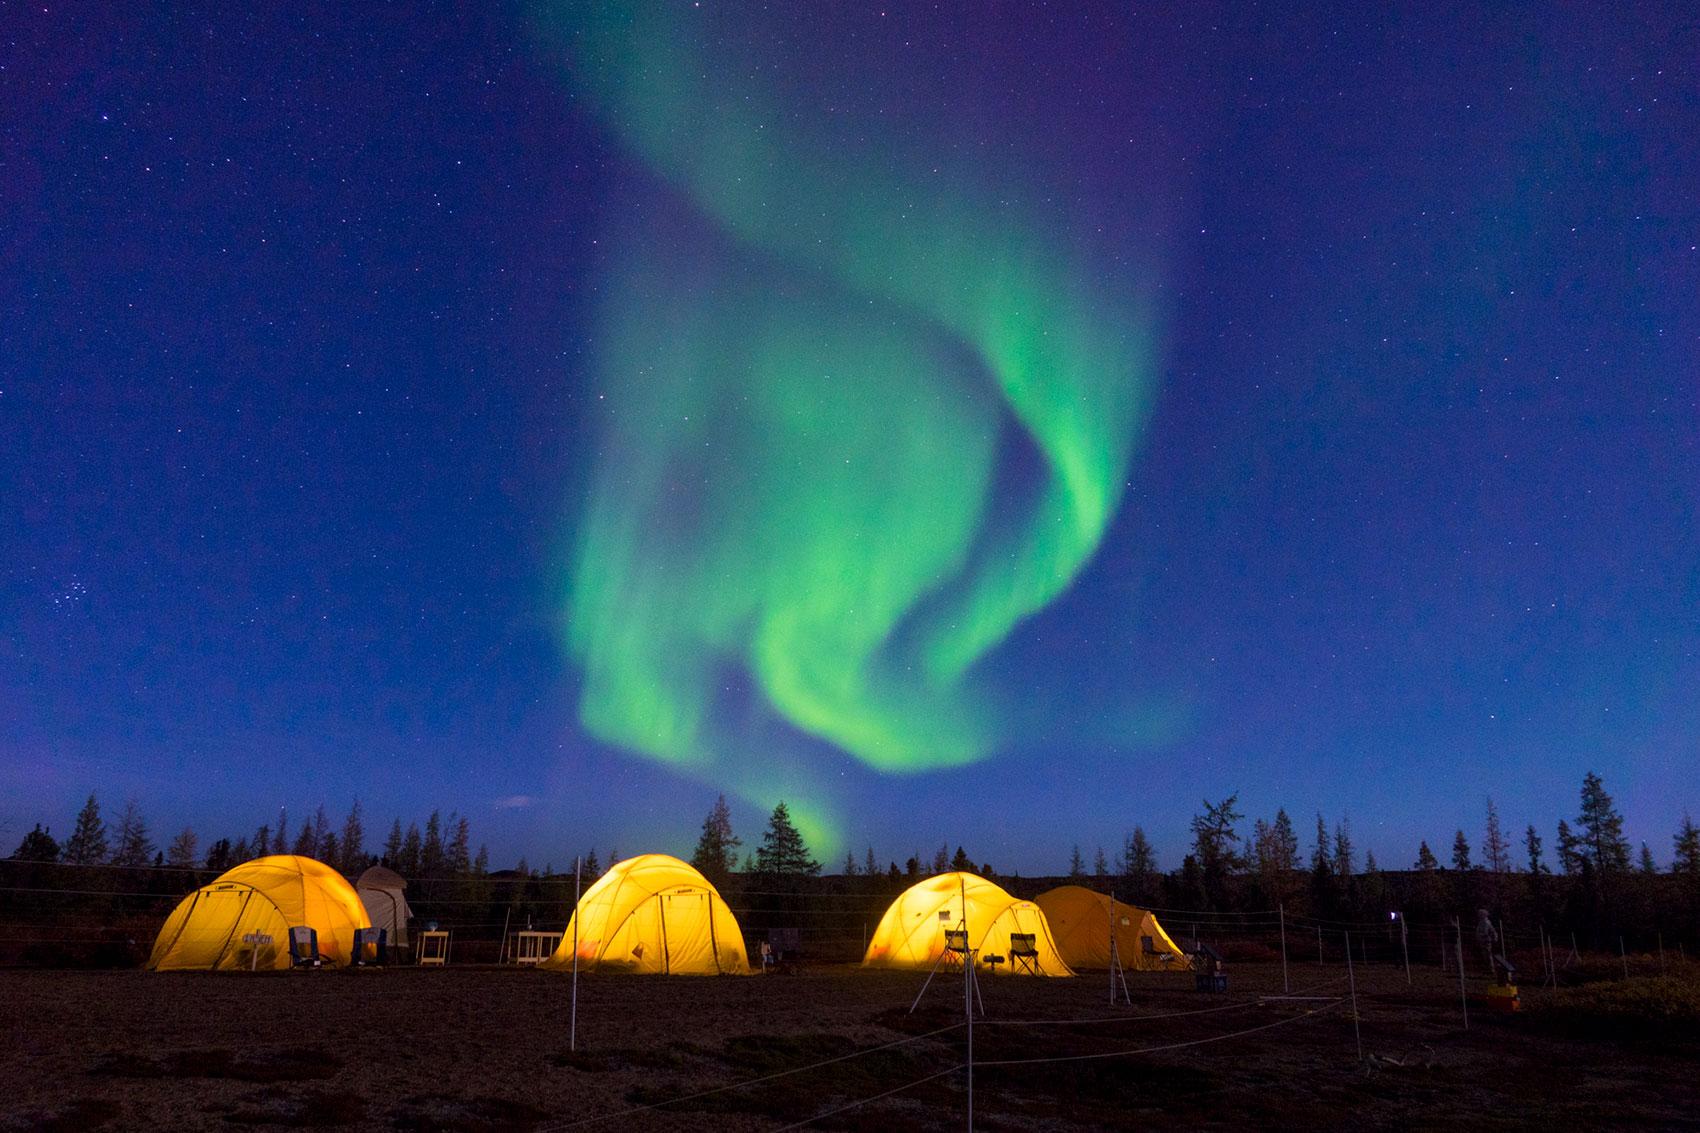 Northern lights. Tundra Camp. Arctic Safari. Jad Davenport photo.